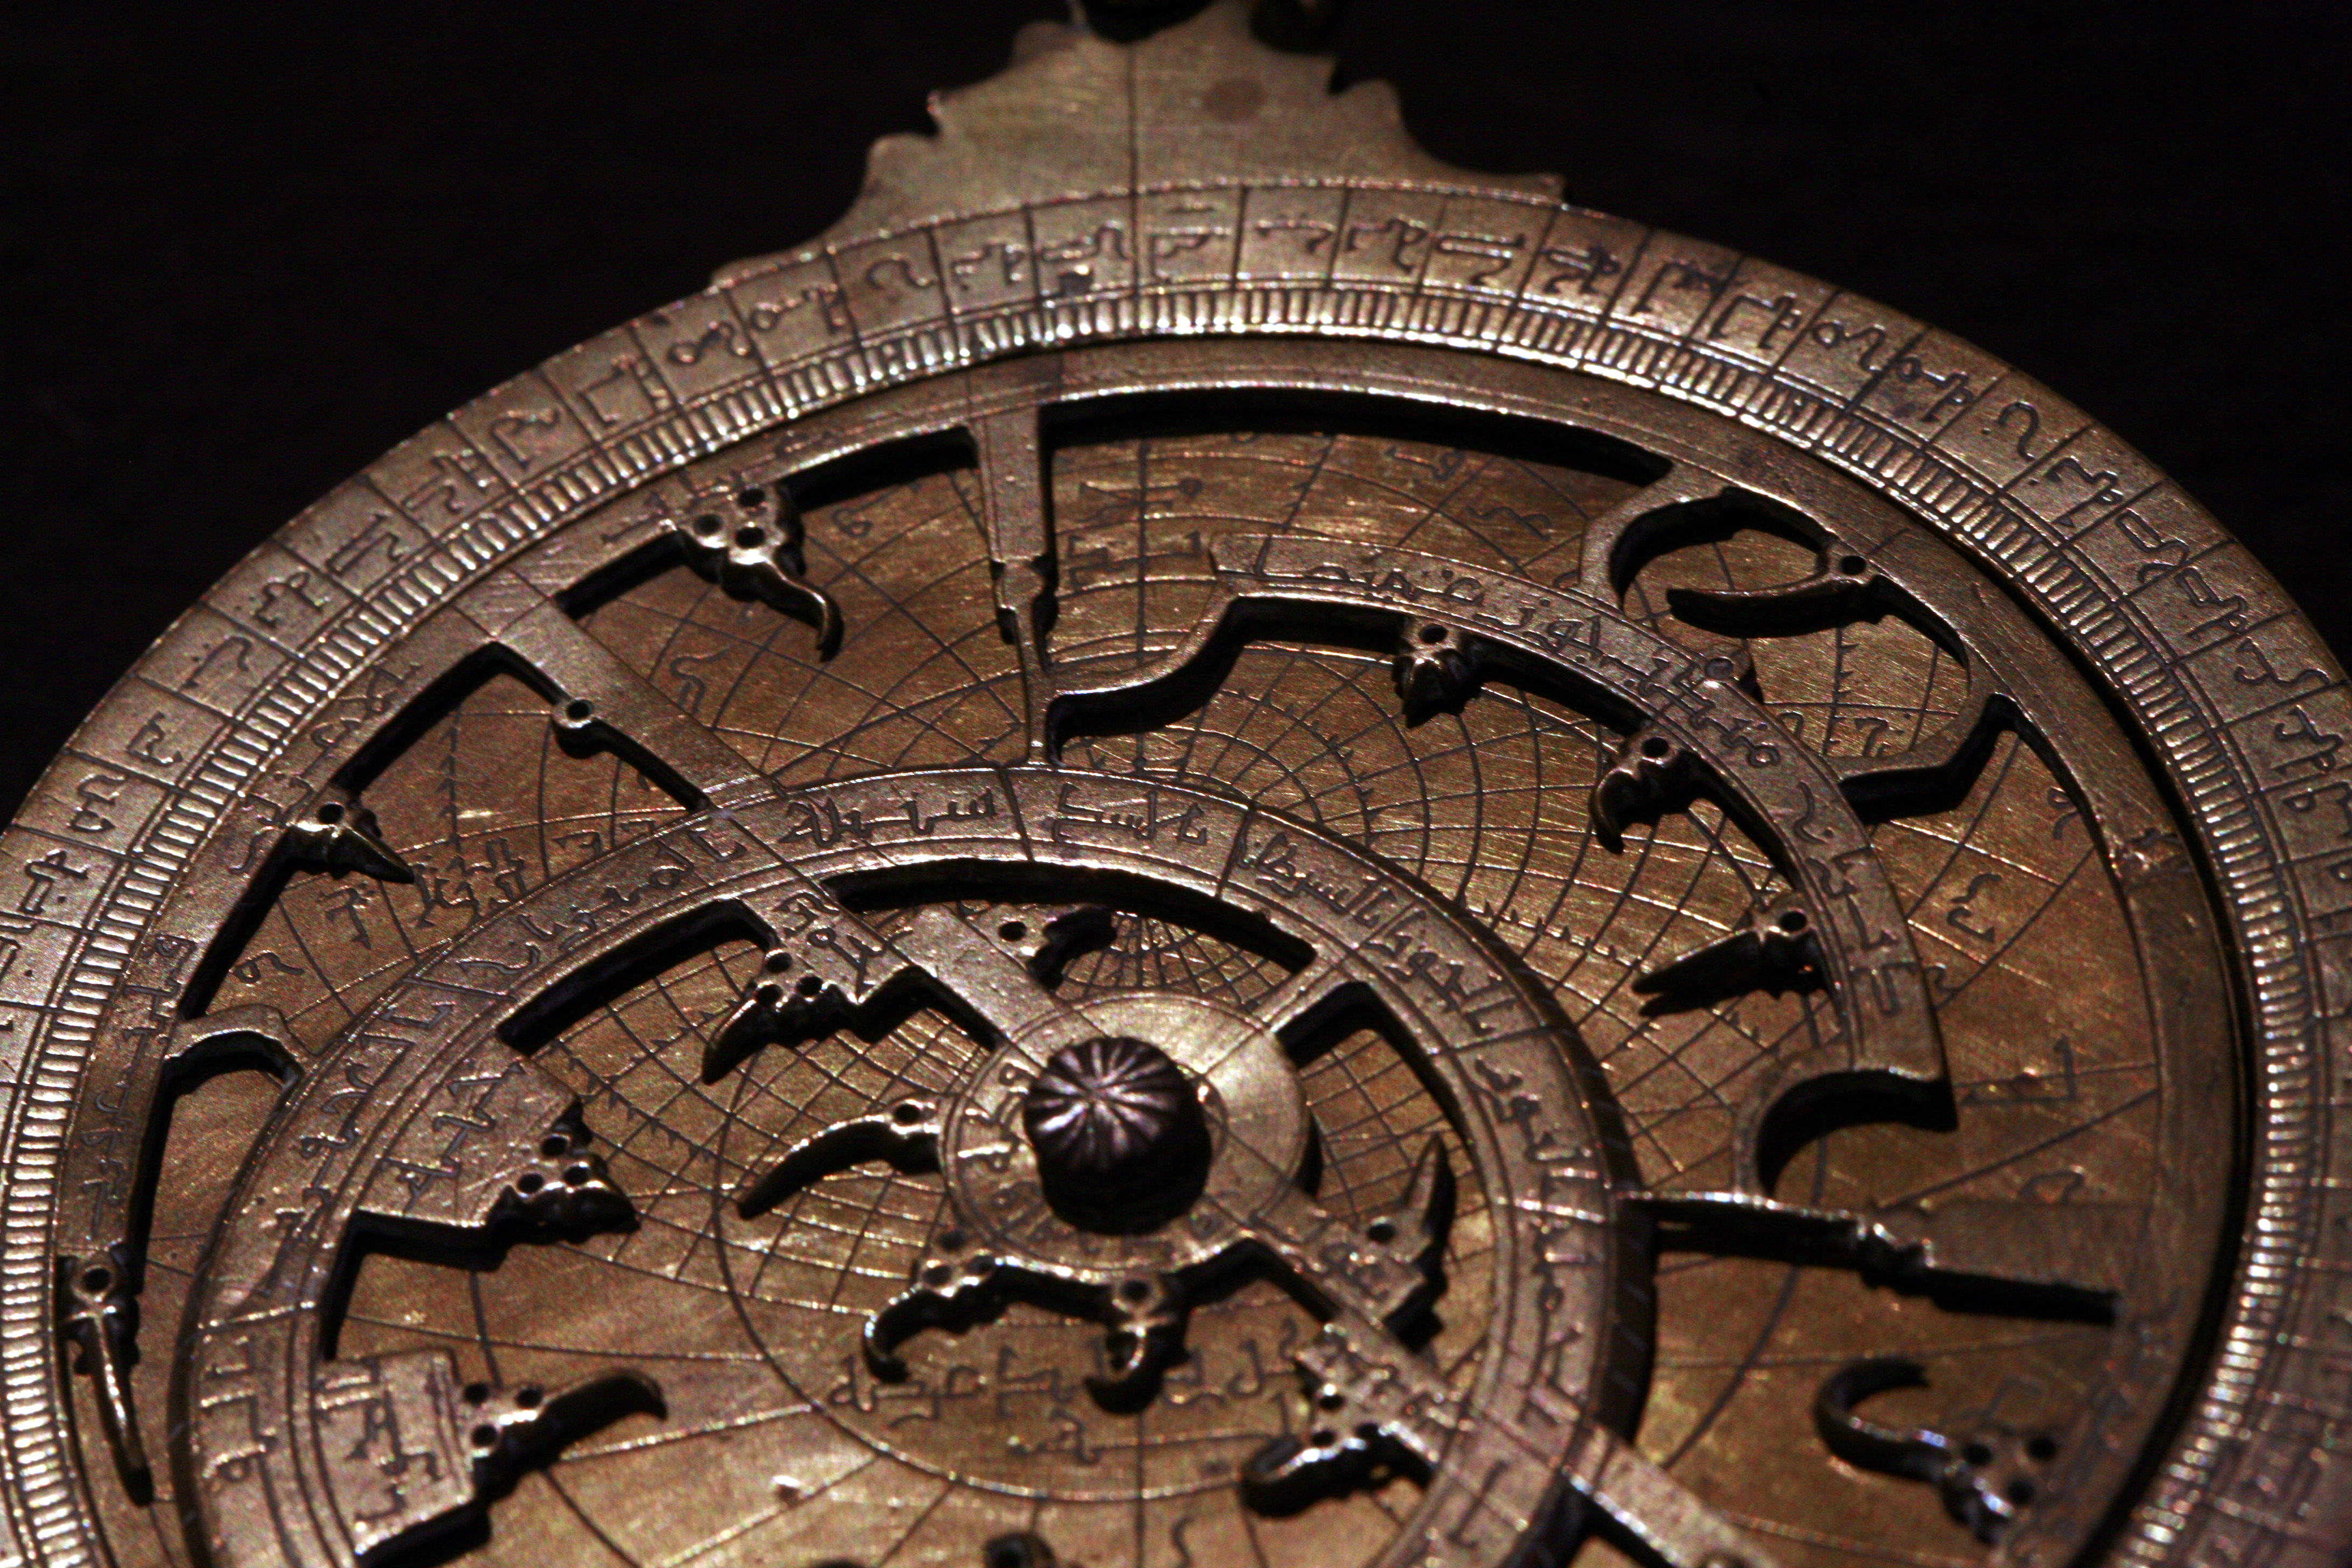 File:Planispherical astrolabe mg 7100.jpg - Wikimedia Commons